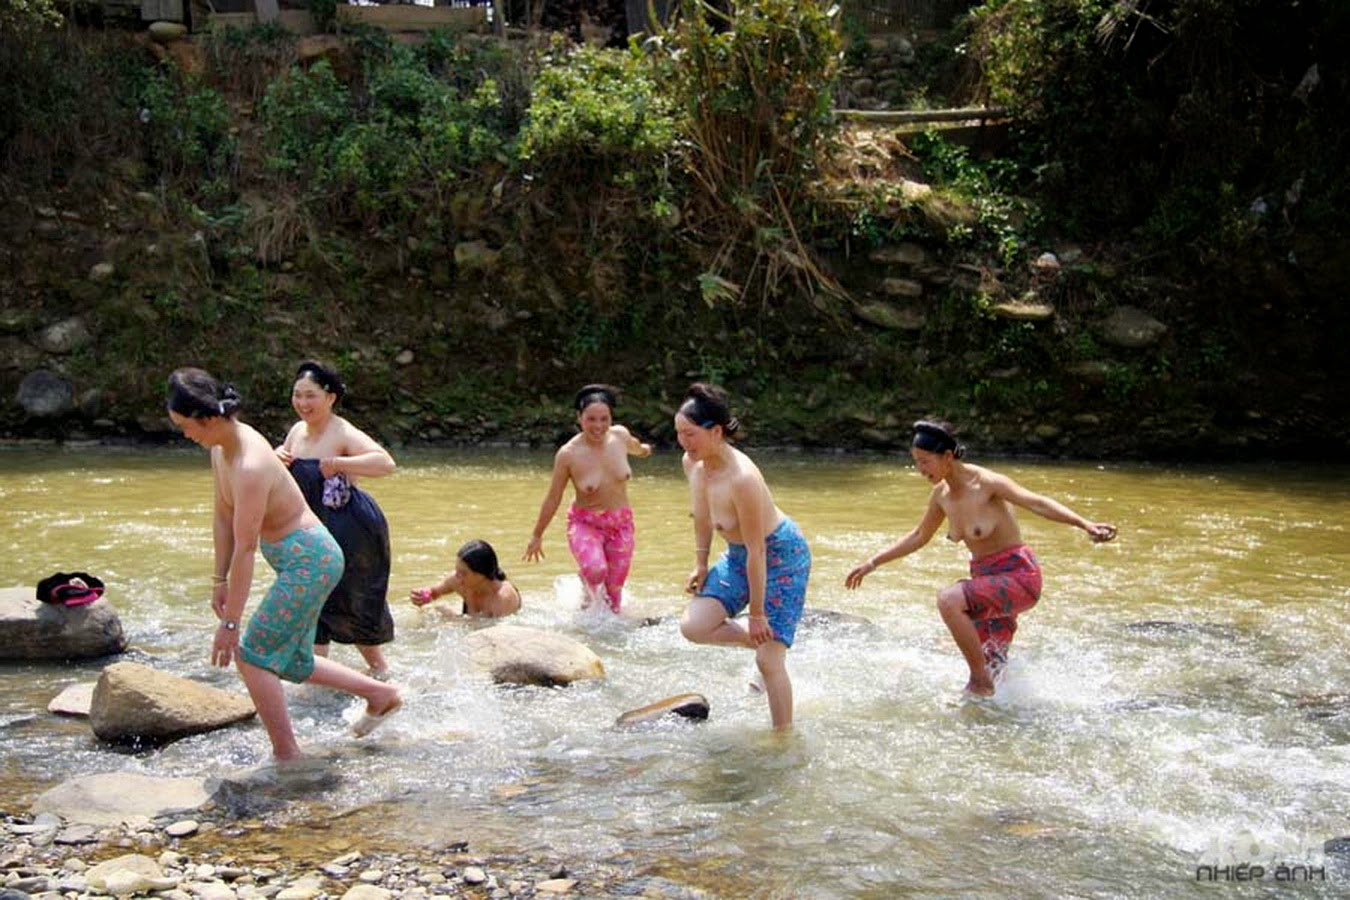 china-swimming-naked-video-women-older